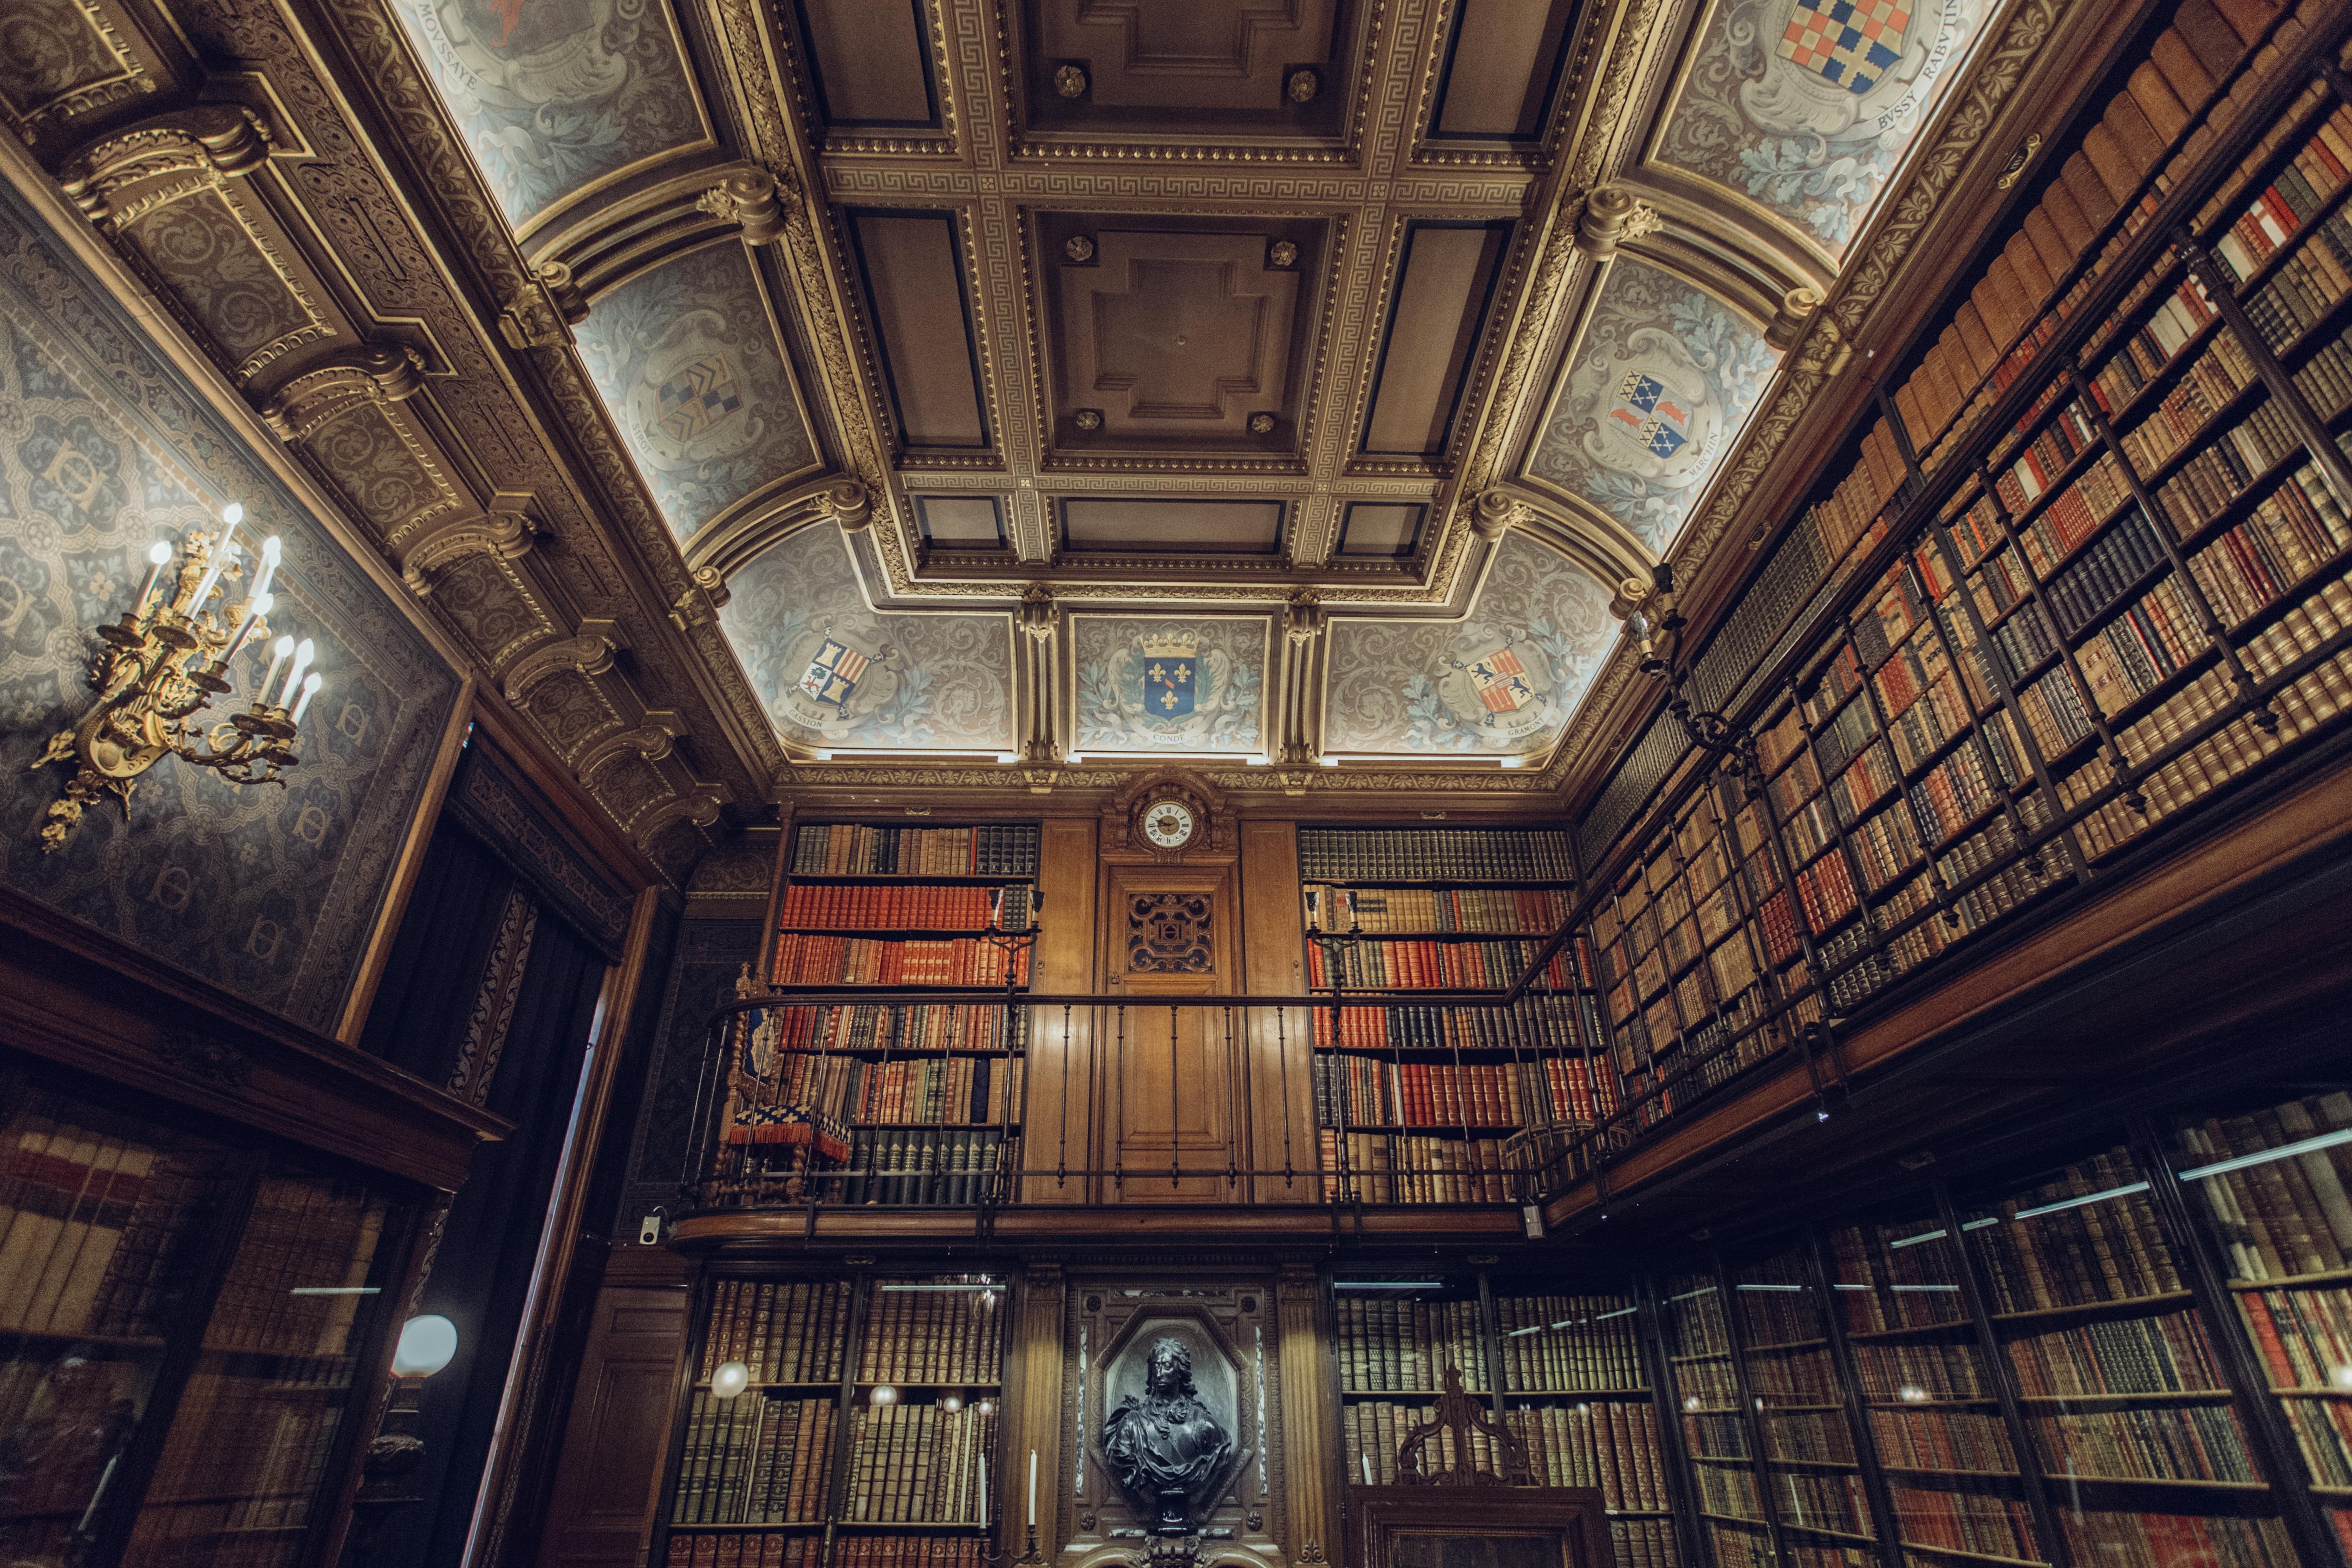 библиотека искусствознания фото вот, среди